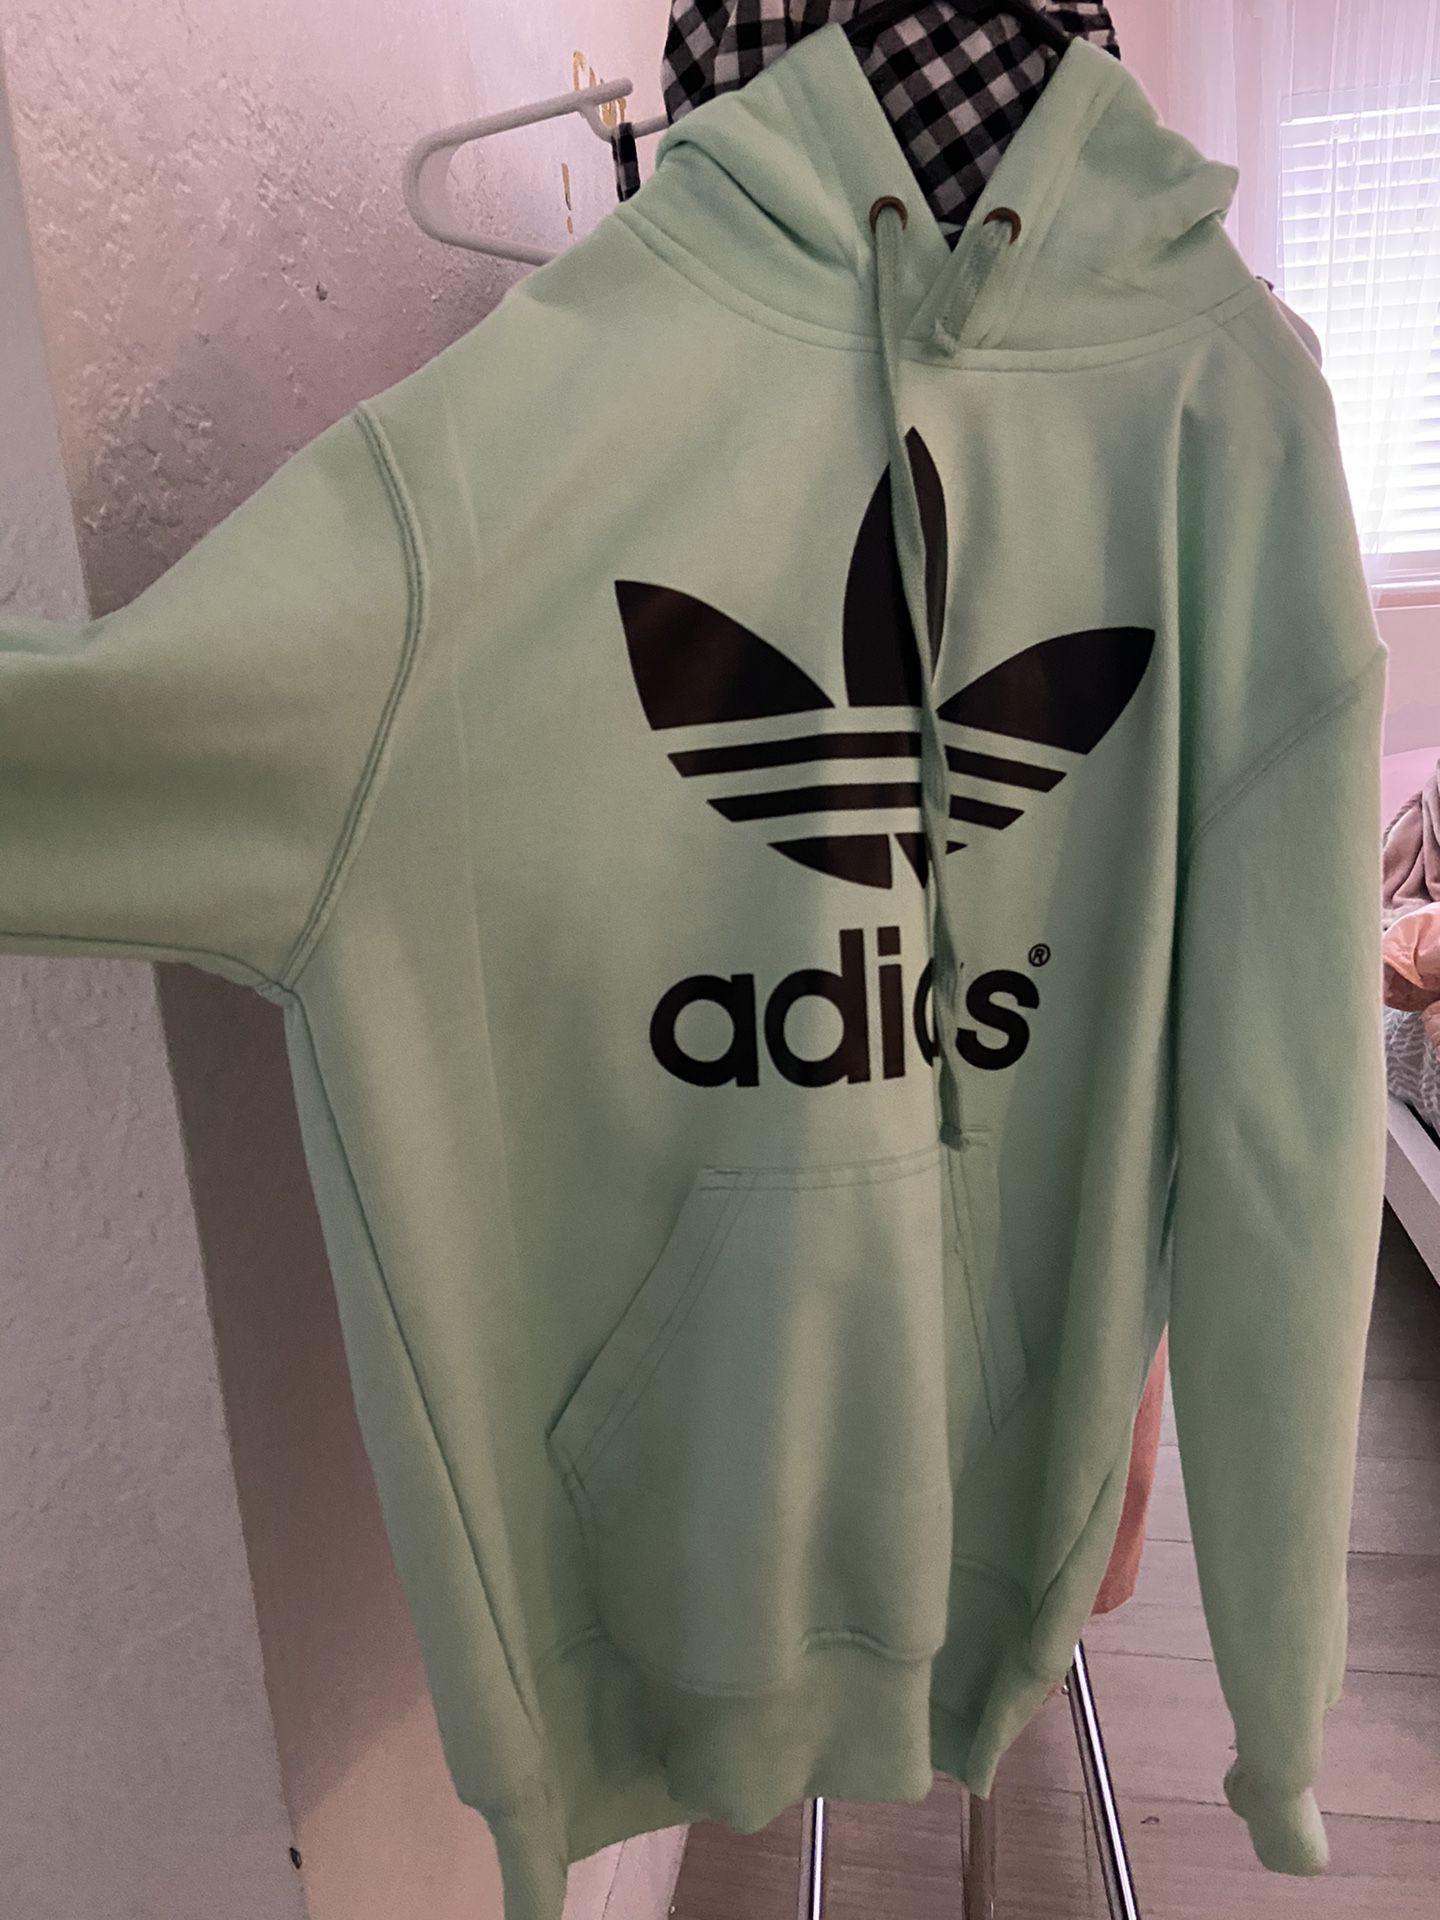 Mint color adidas hoodie